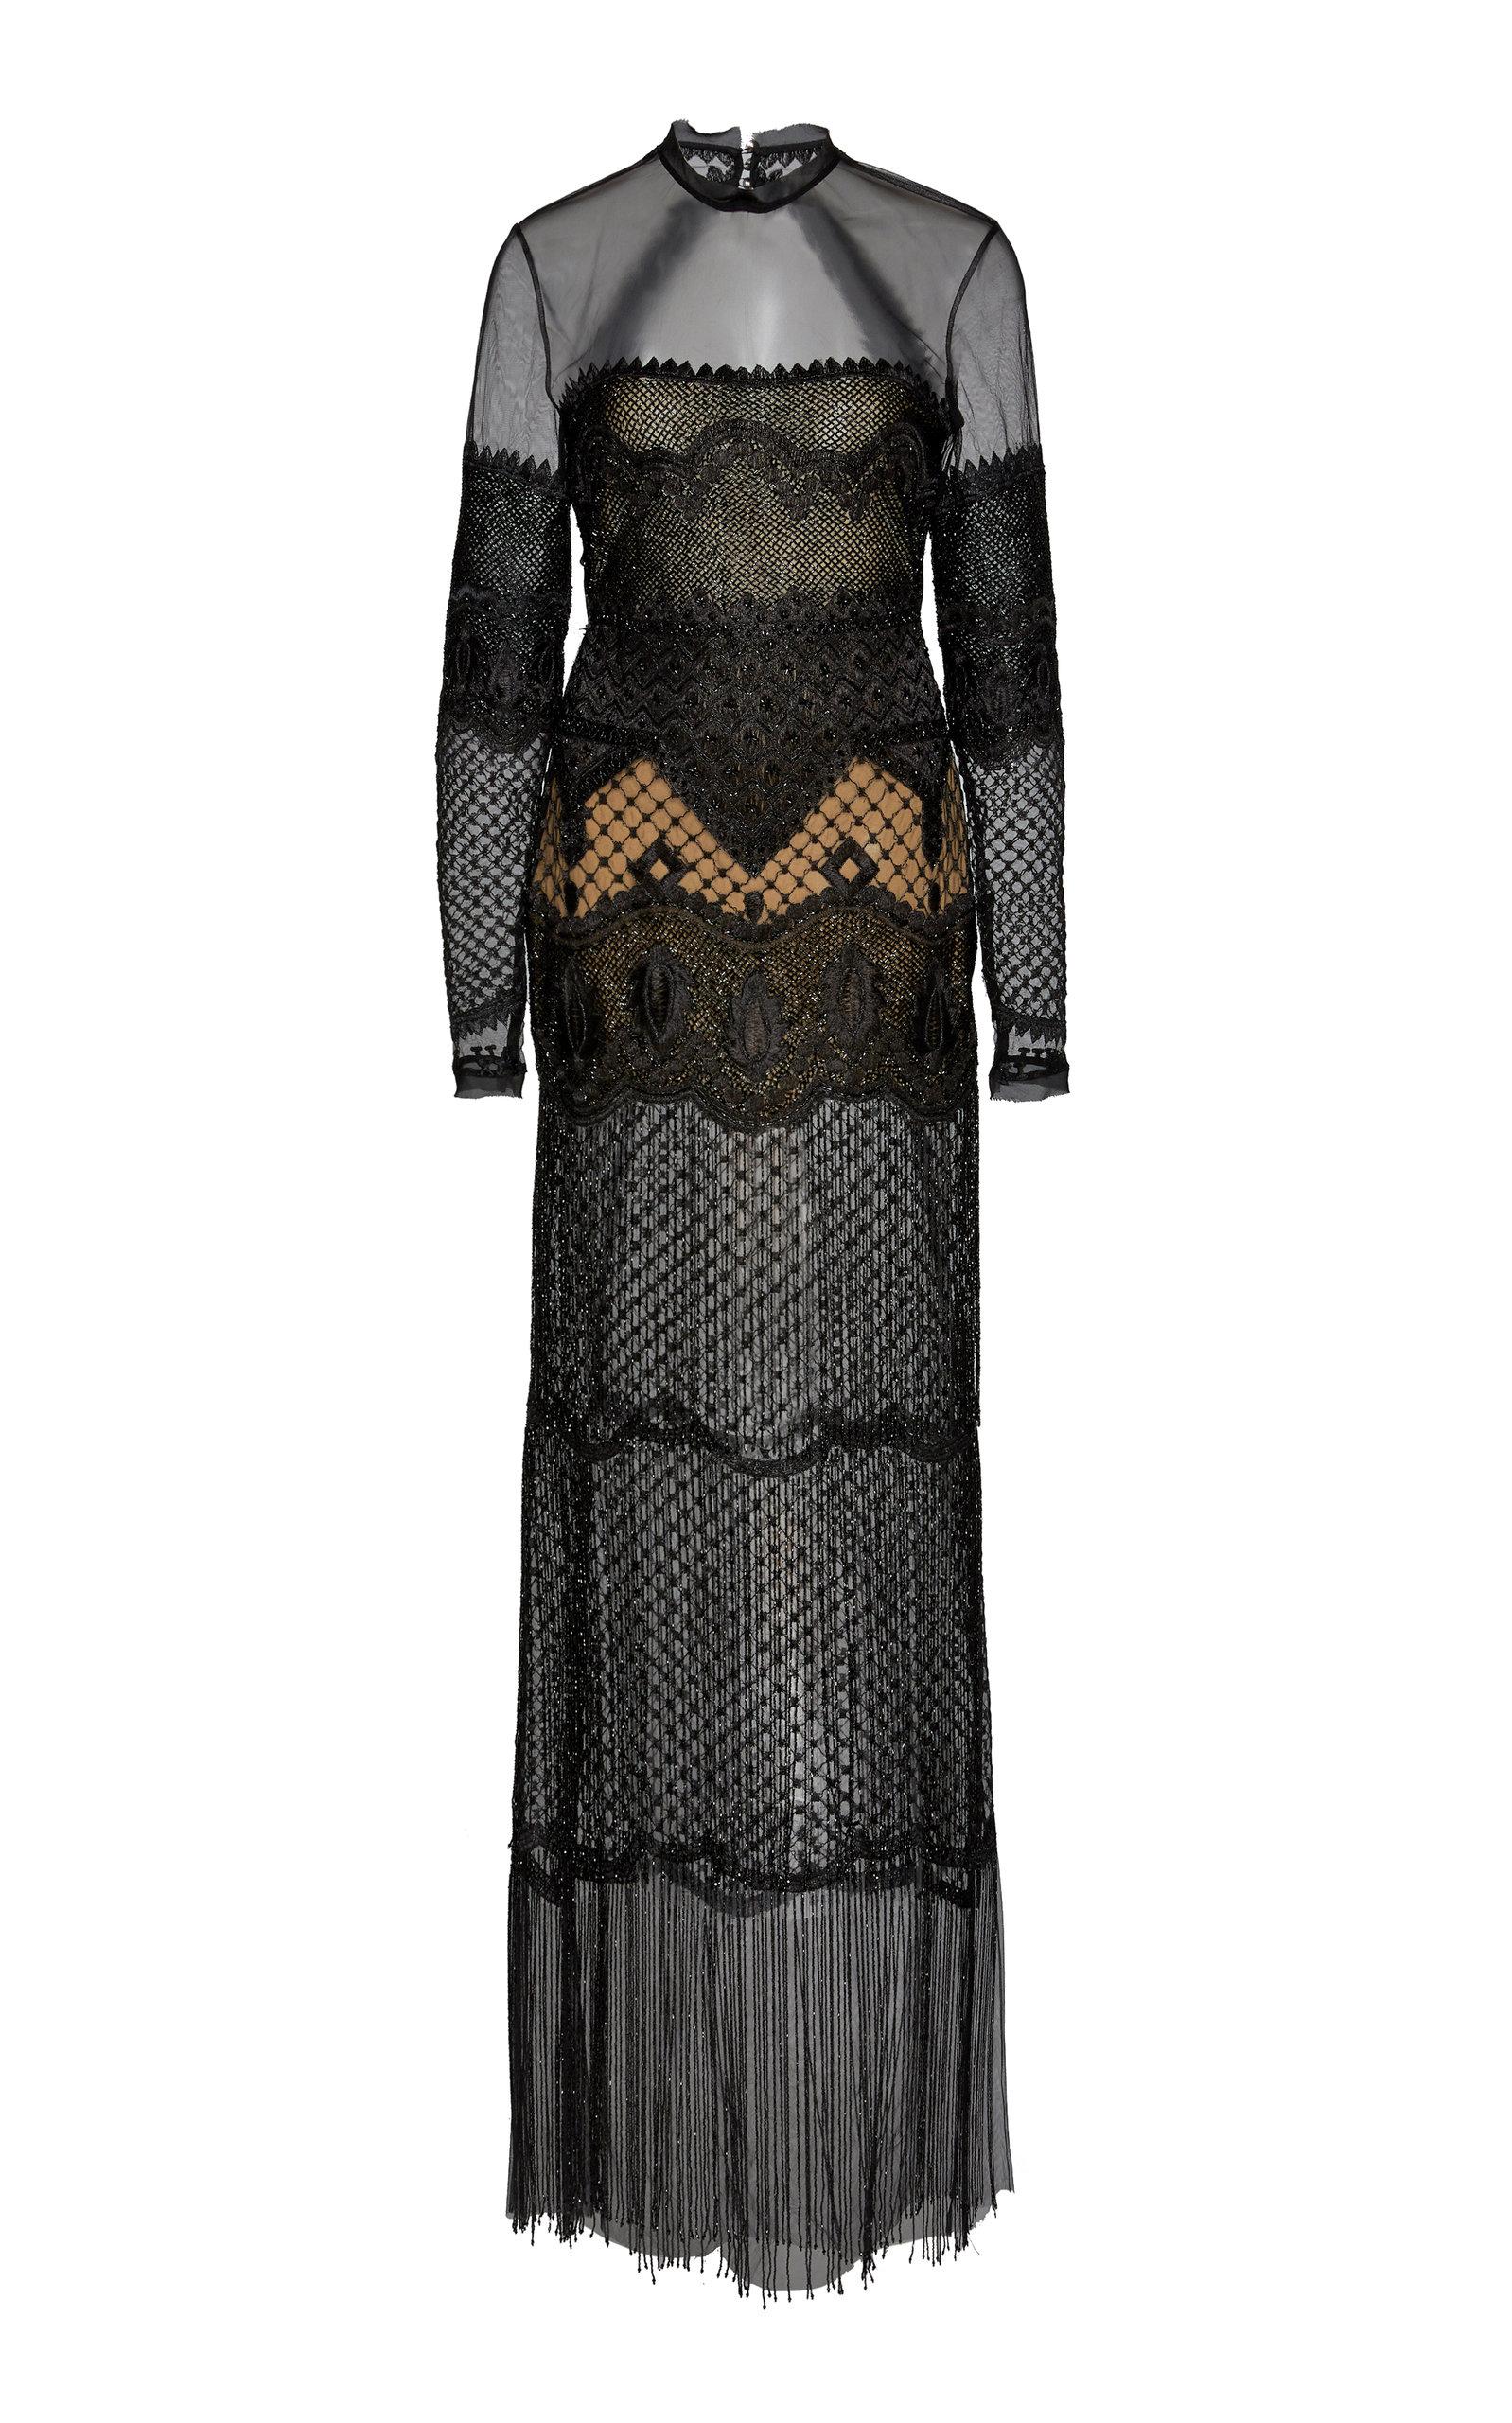 CUCCULELLI SHAHEEN Customizable Midnight Dreamweaver Tulle Gown in Black